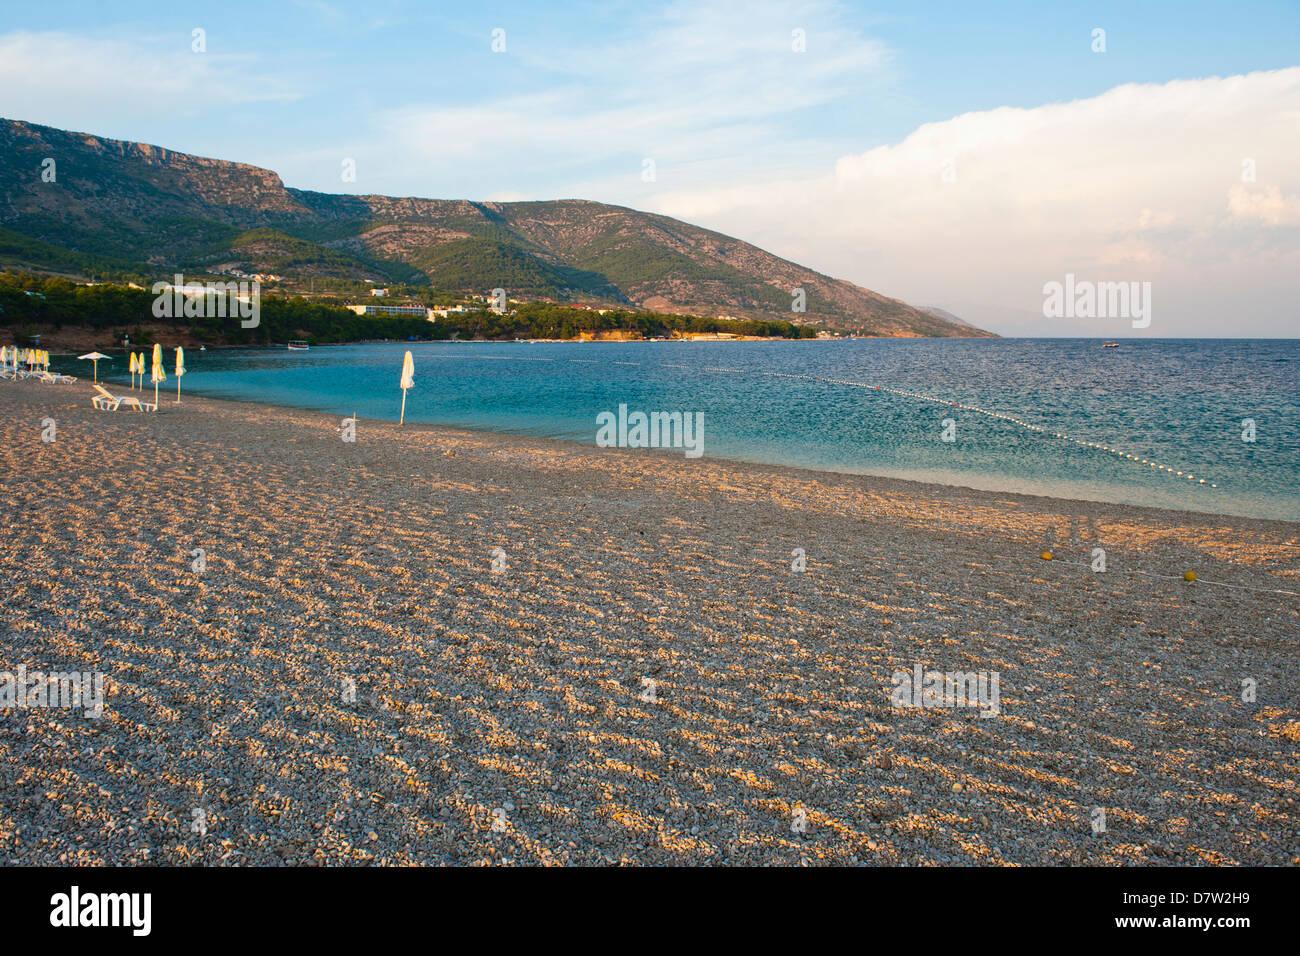 Zlatni Rat Beach at sunset, Bol, Brac Island, Dalmatian Coast, Adriatic, Croatia - Stock Image